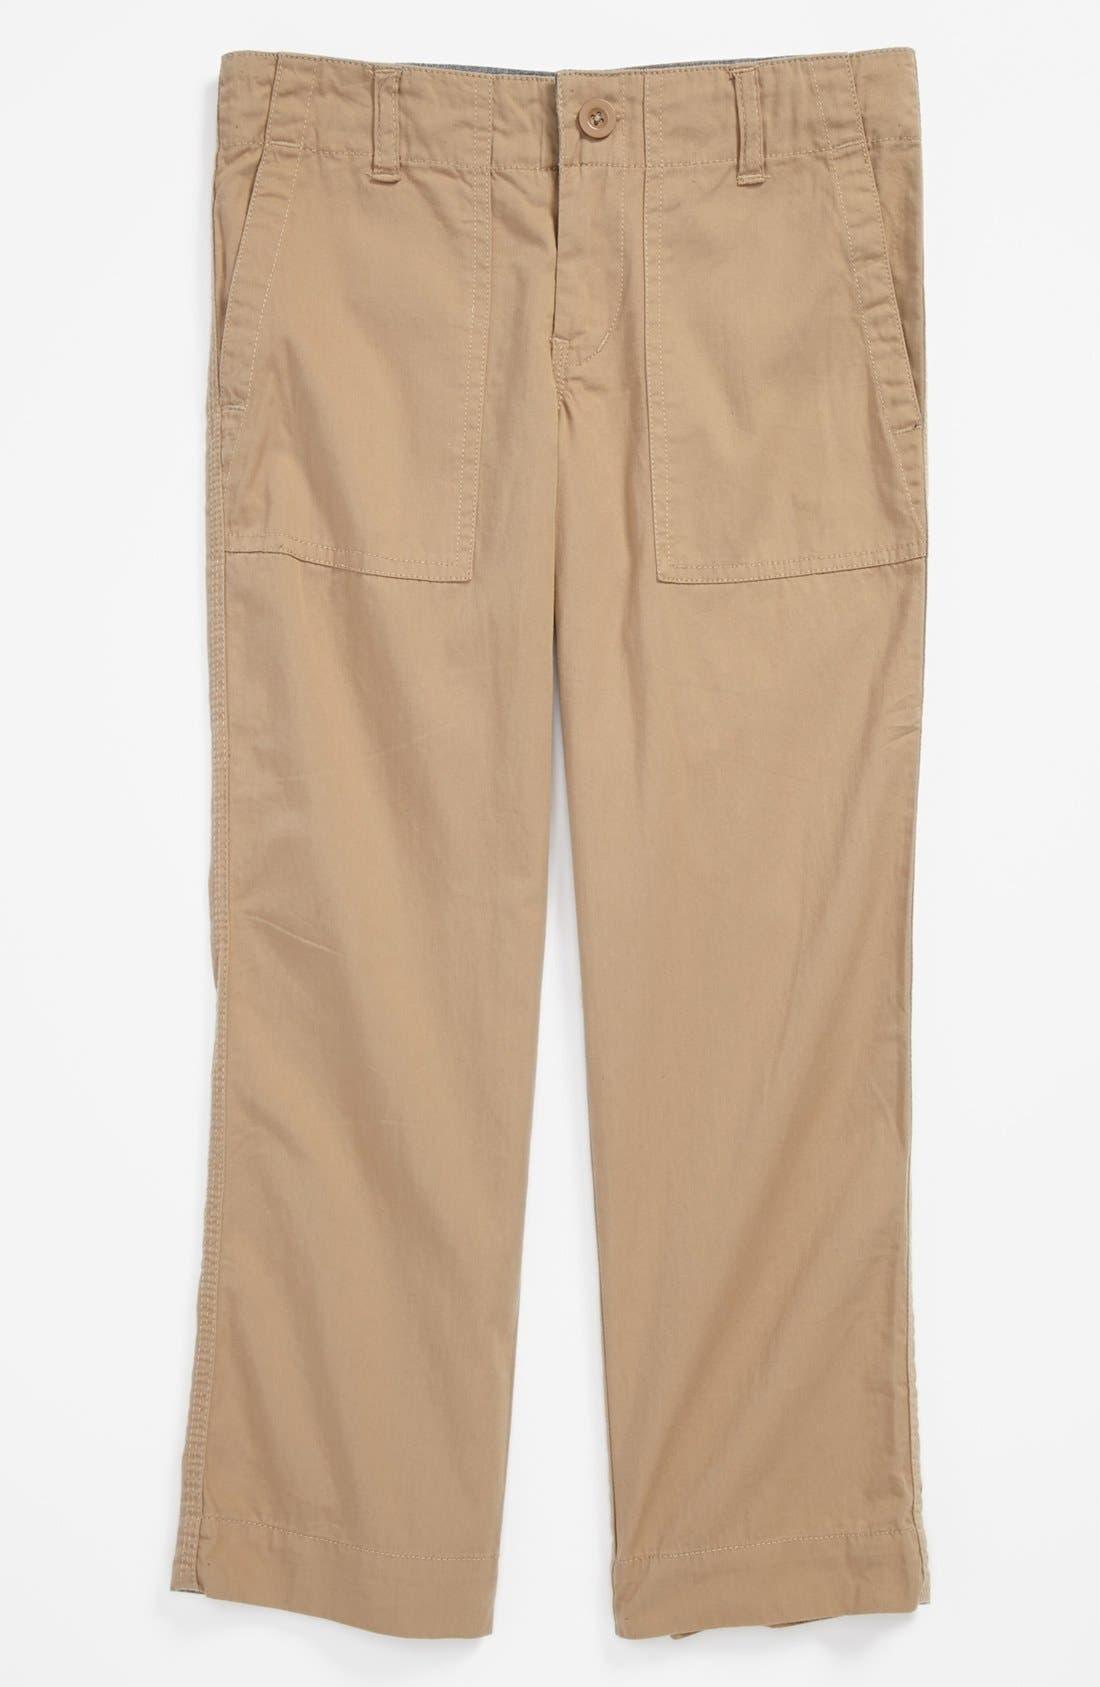 Alternate Image 1 Selected - Peek 'Tilden' Utility Pants (Big Boys)